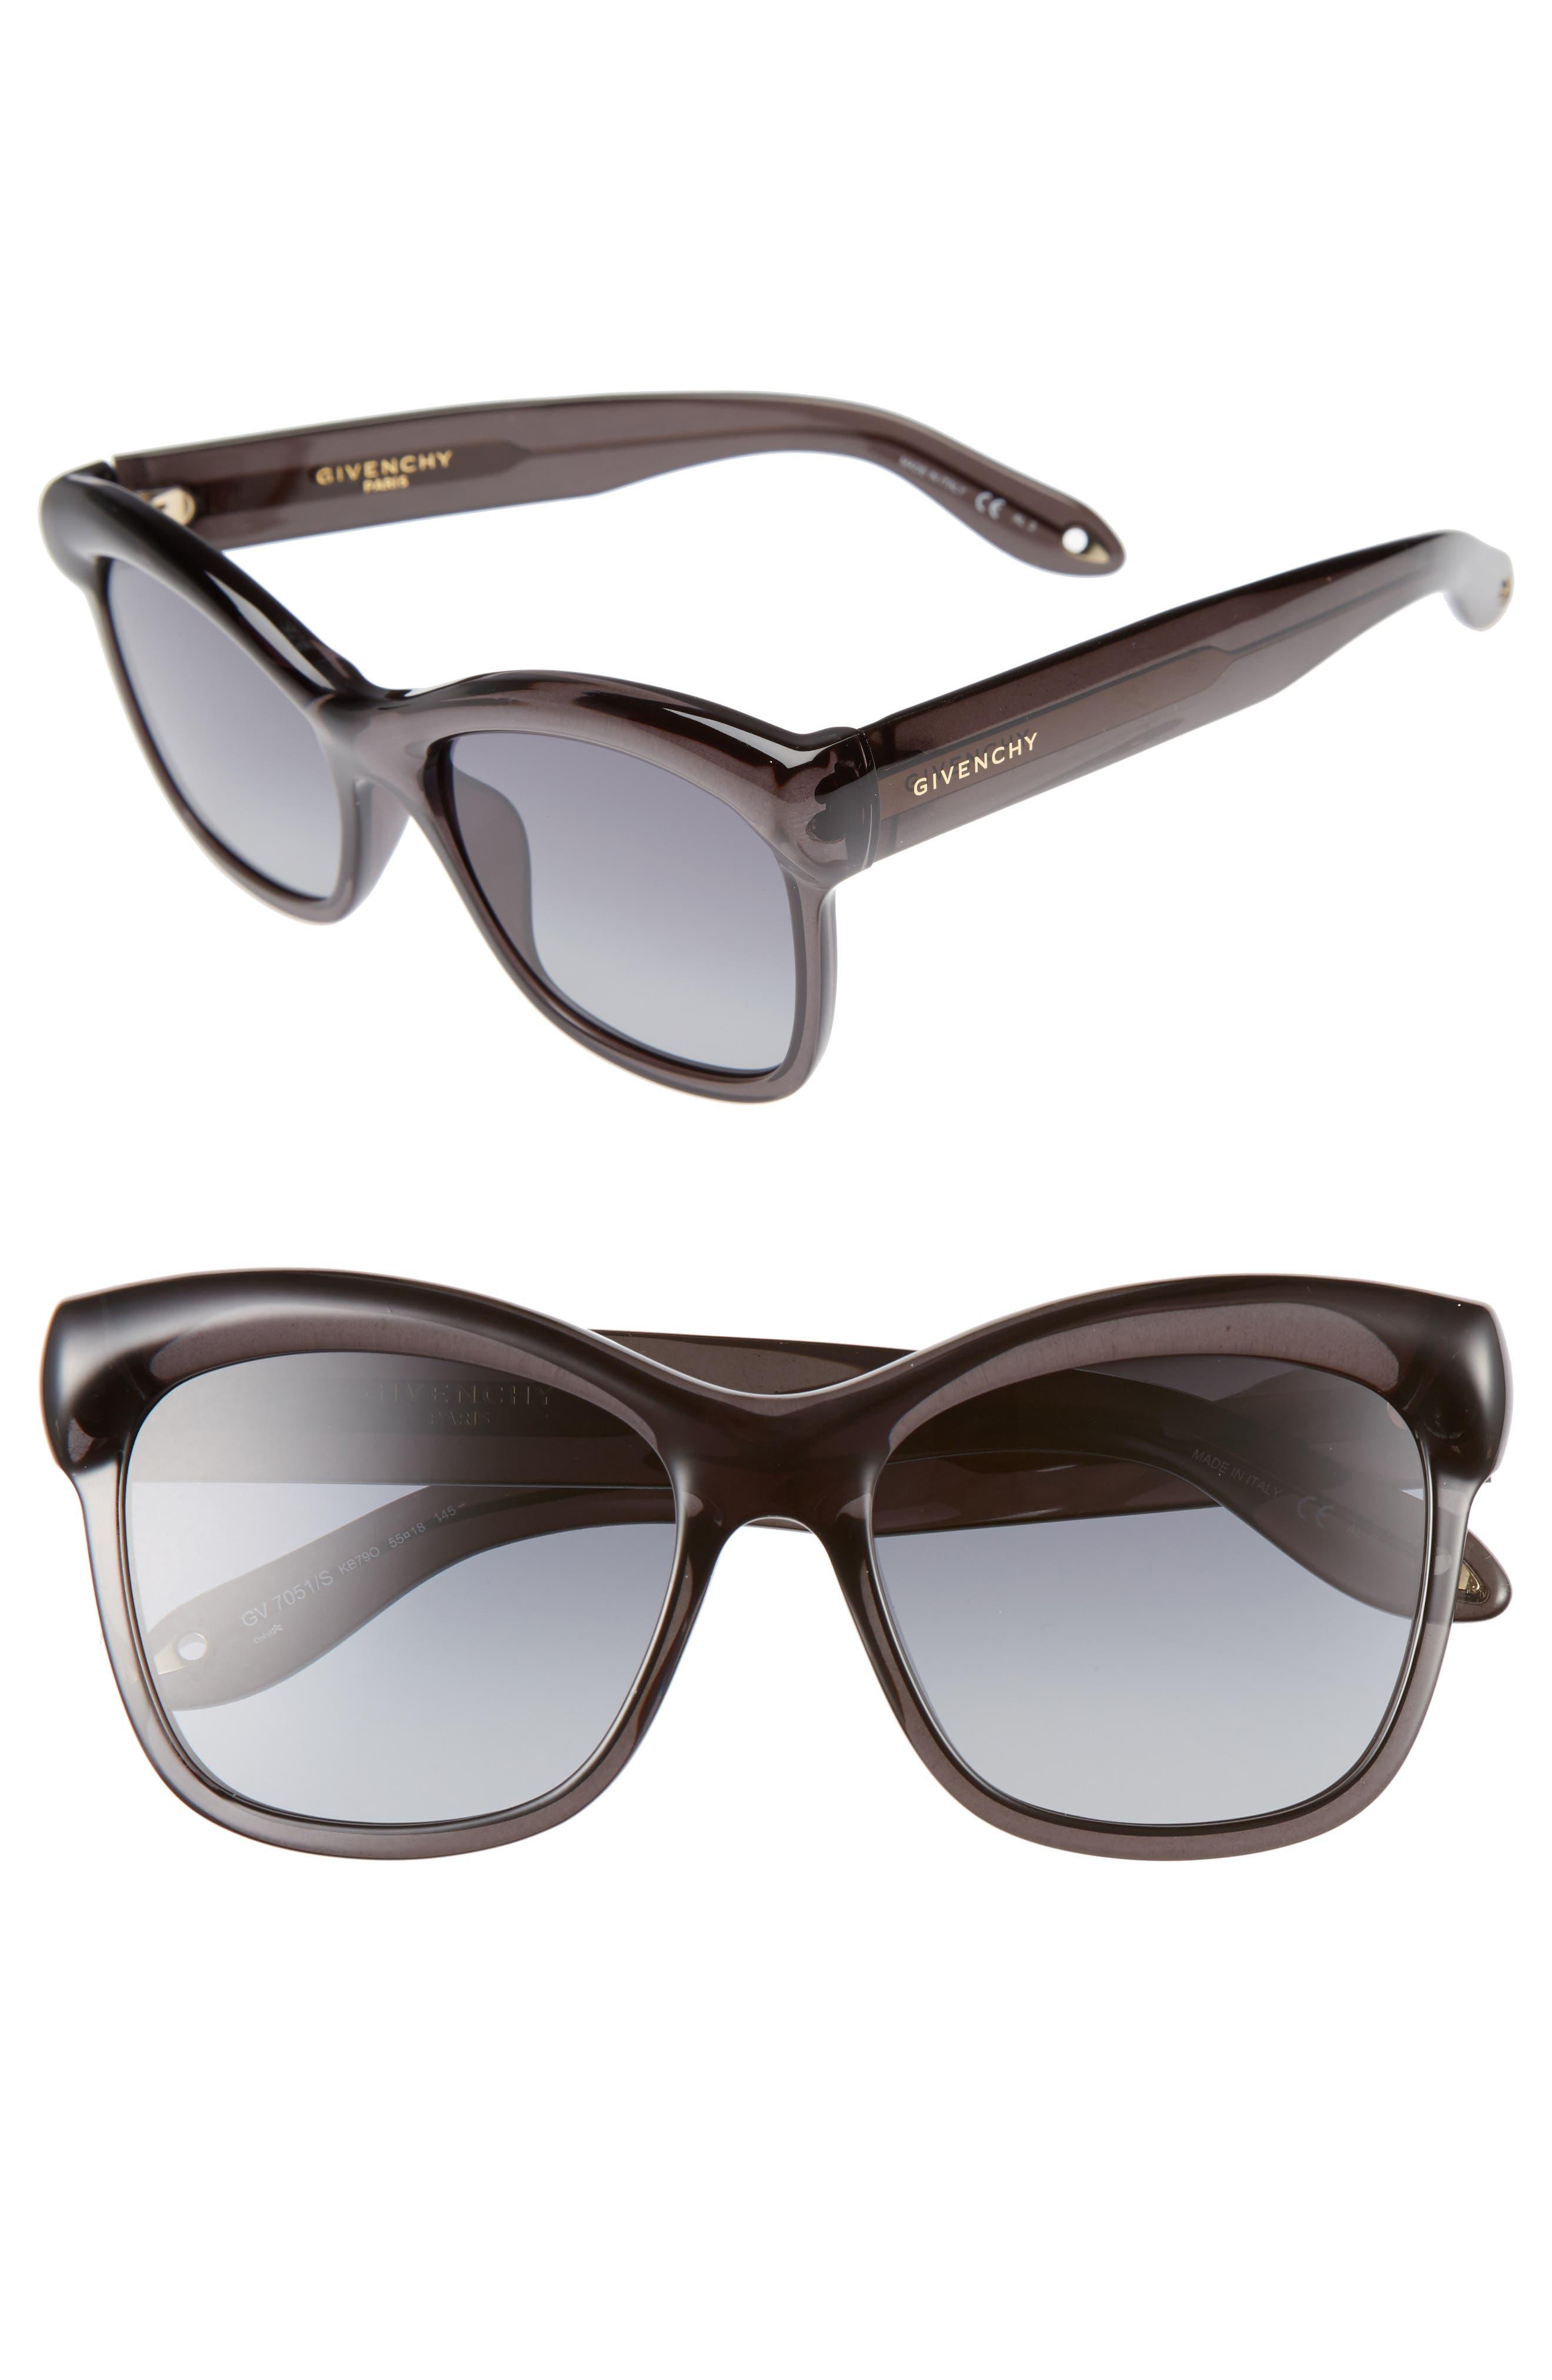 55mm Retro Sunglasses,                             Main thumbnail 1, color,                             020